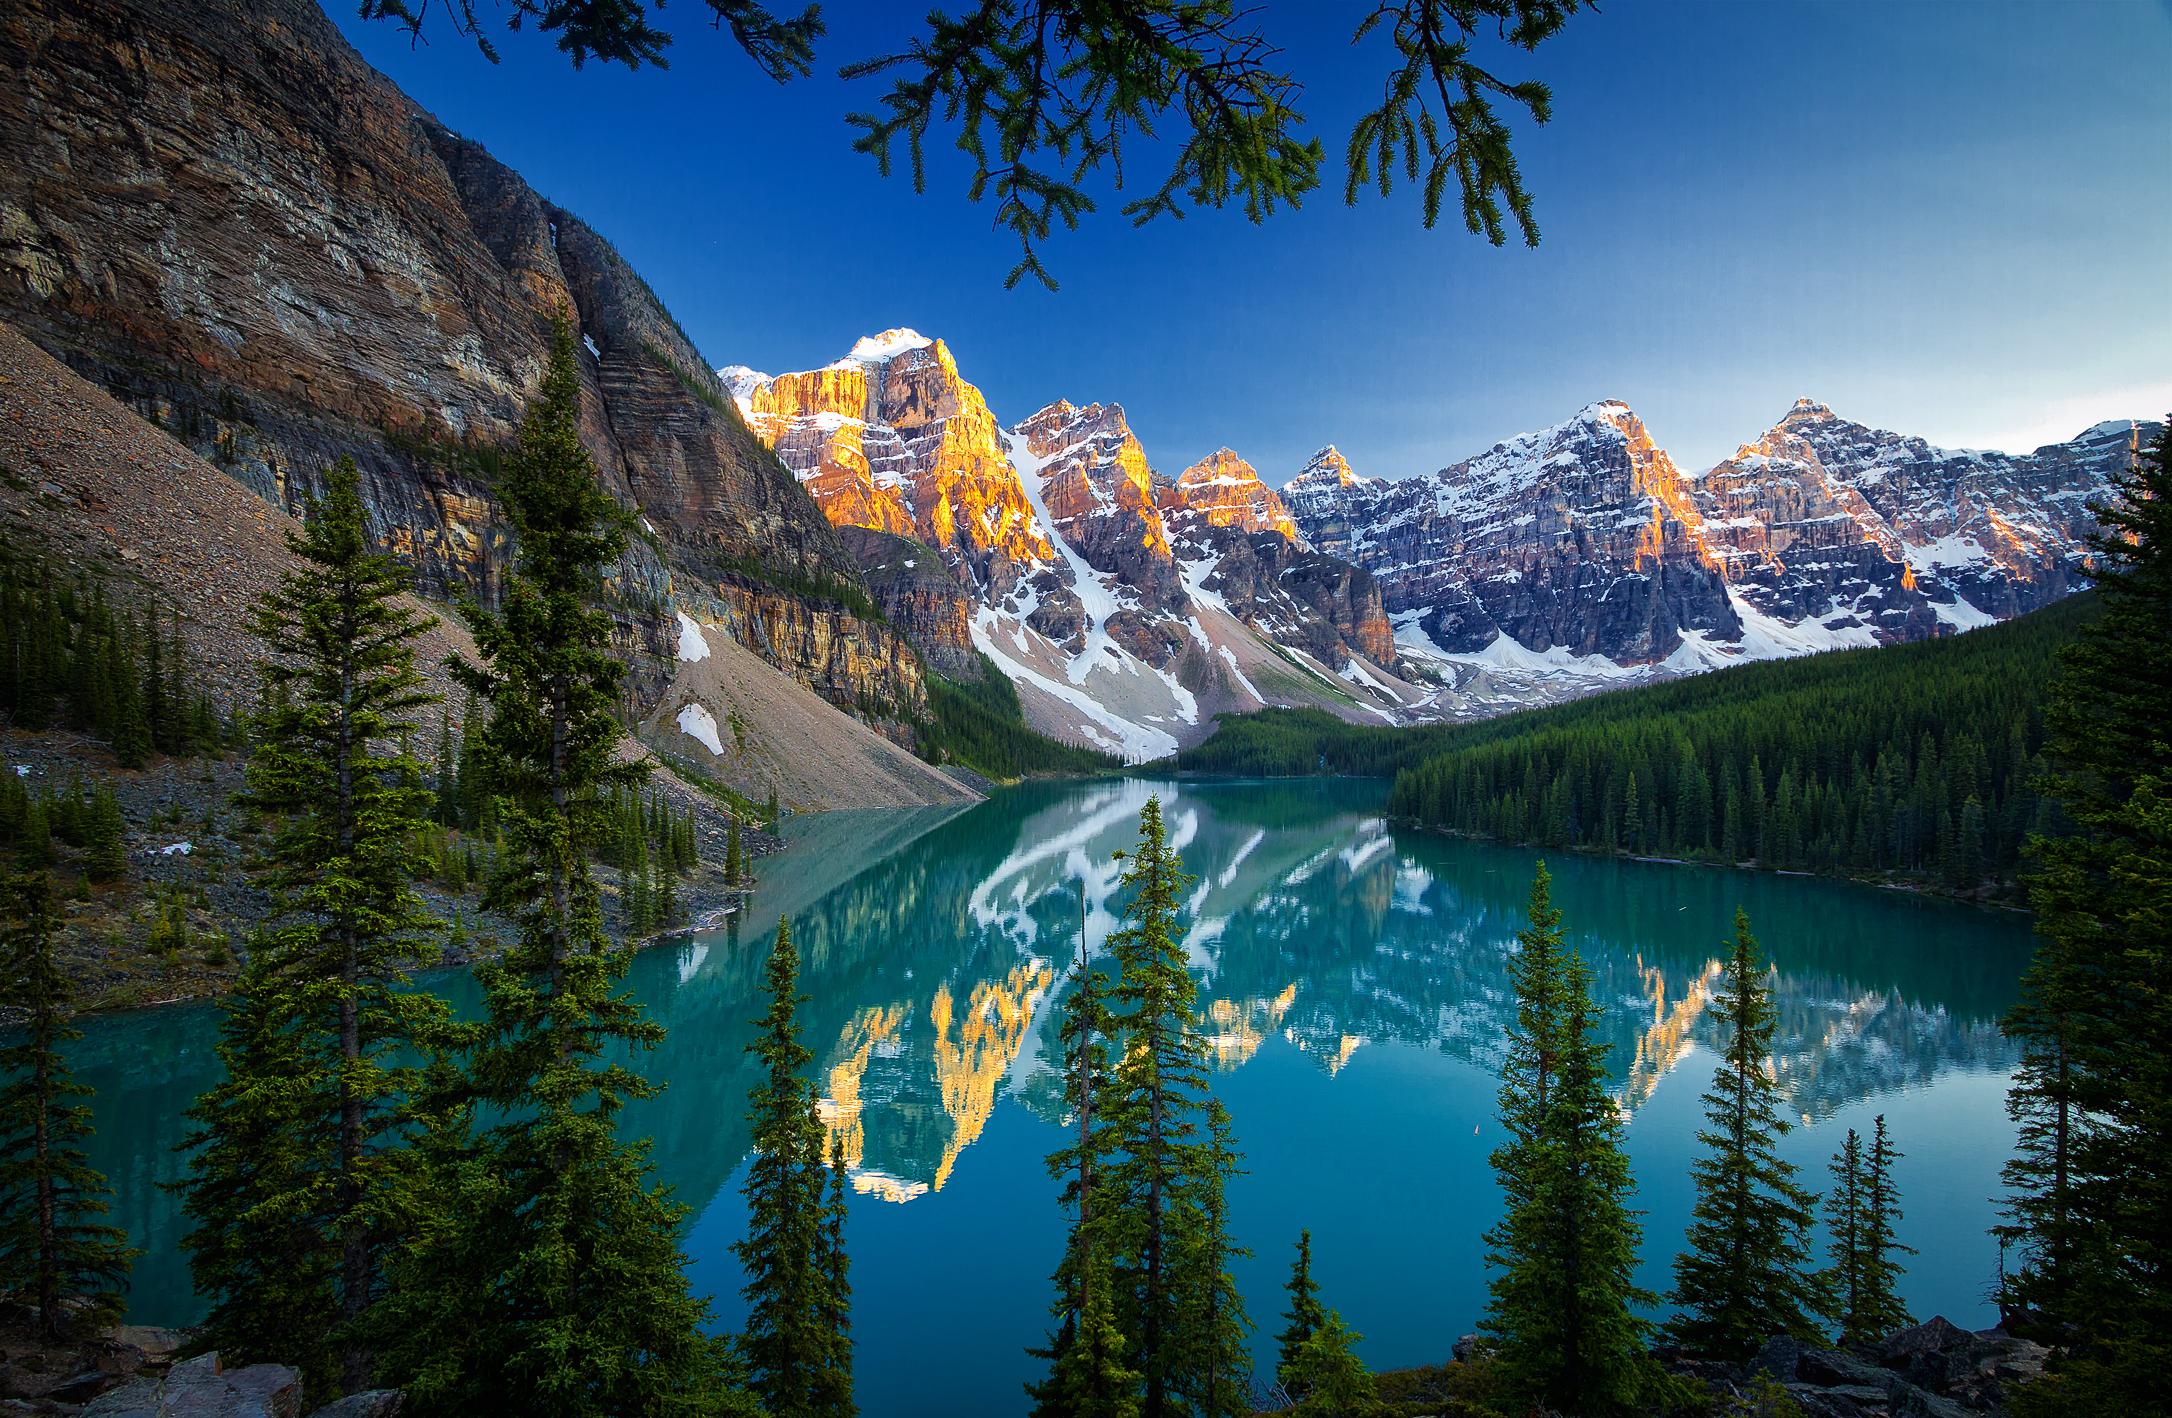 Moraine Lake, Banff National Park, озеро